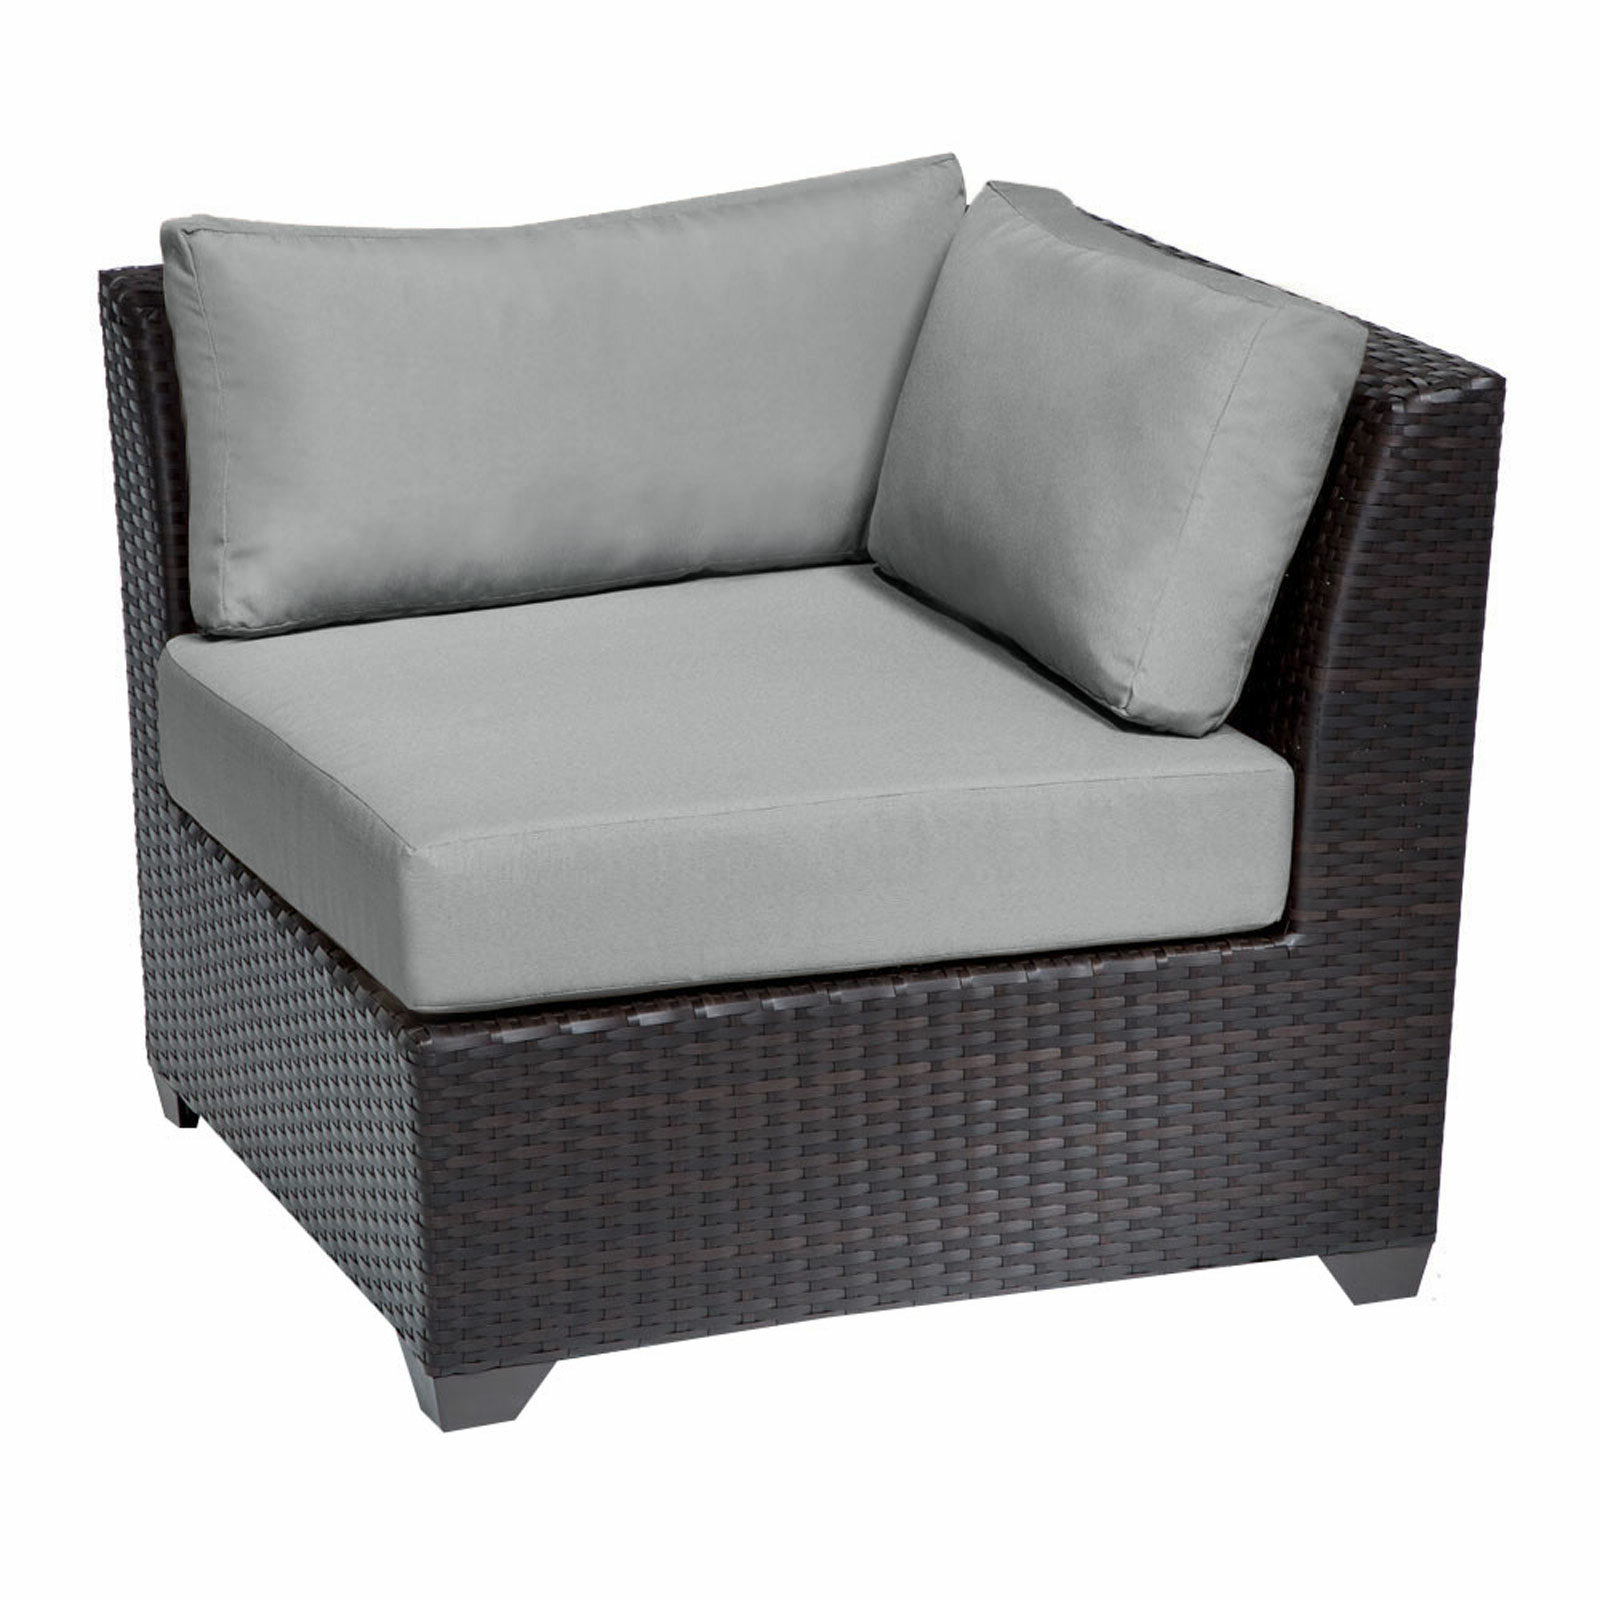 Tegan Patio Sofas With Cushions Pertaining To Fashionable Tegan Patio Chair With Cushions (View 19 of 25)